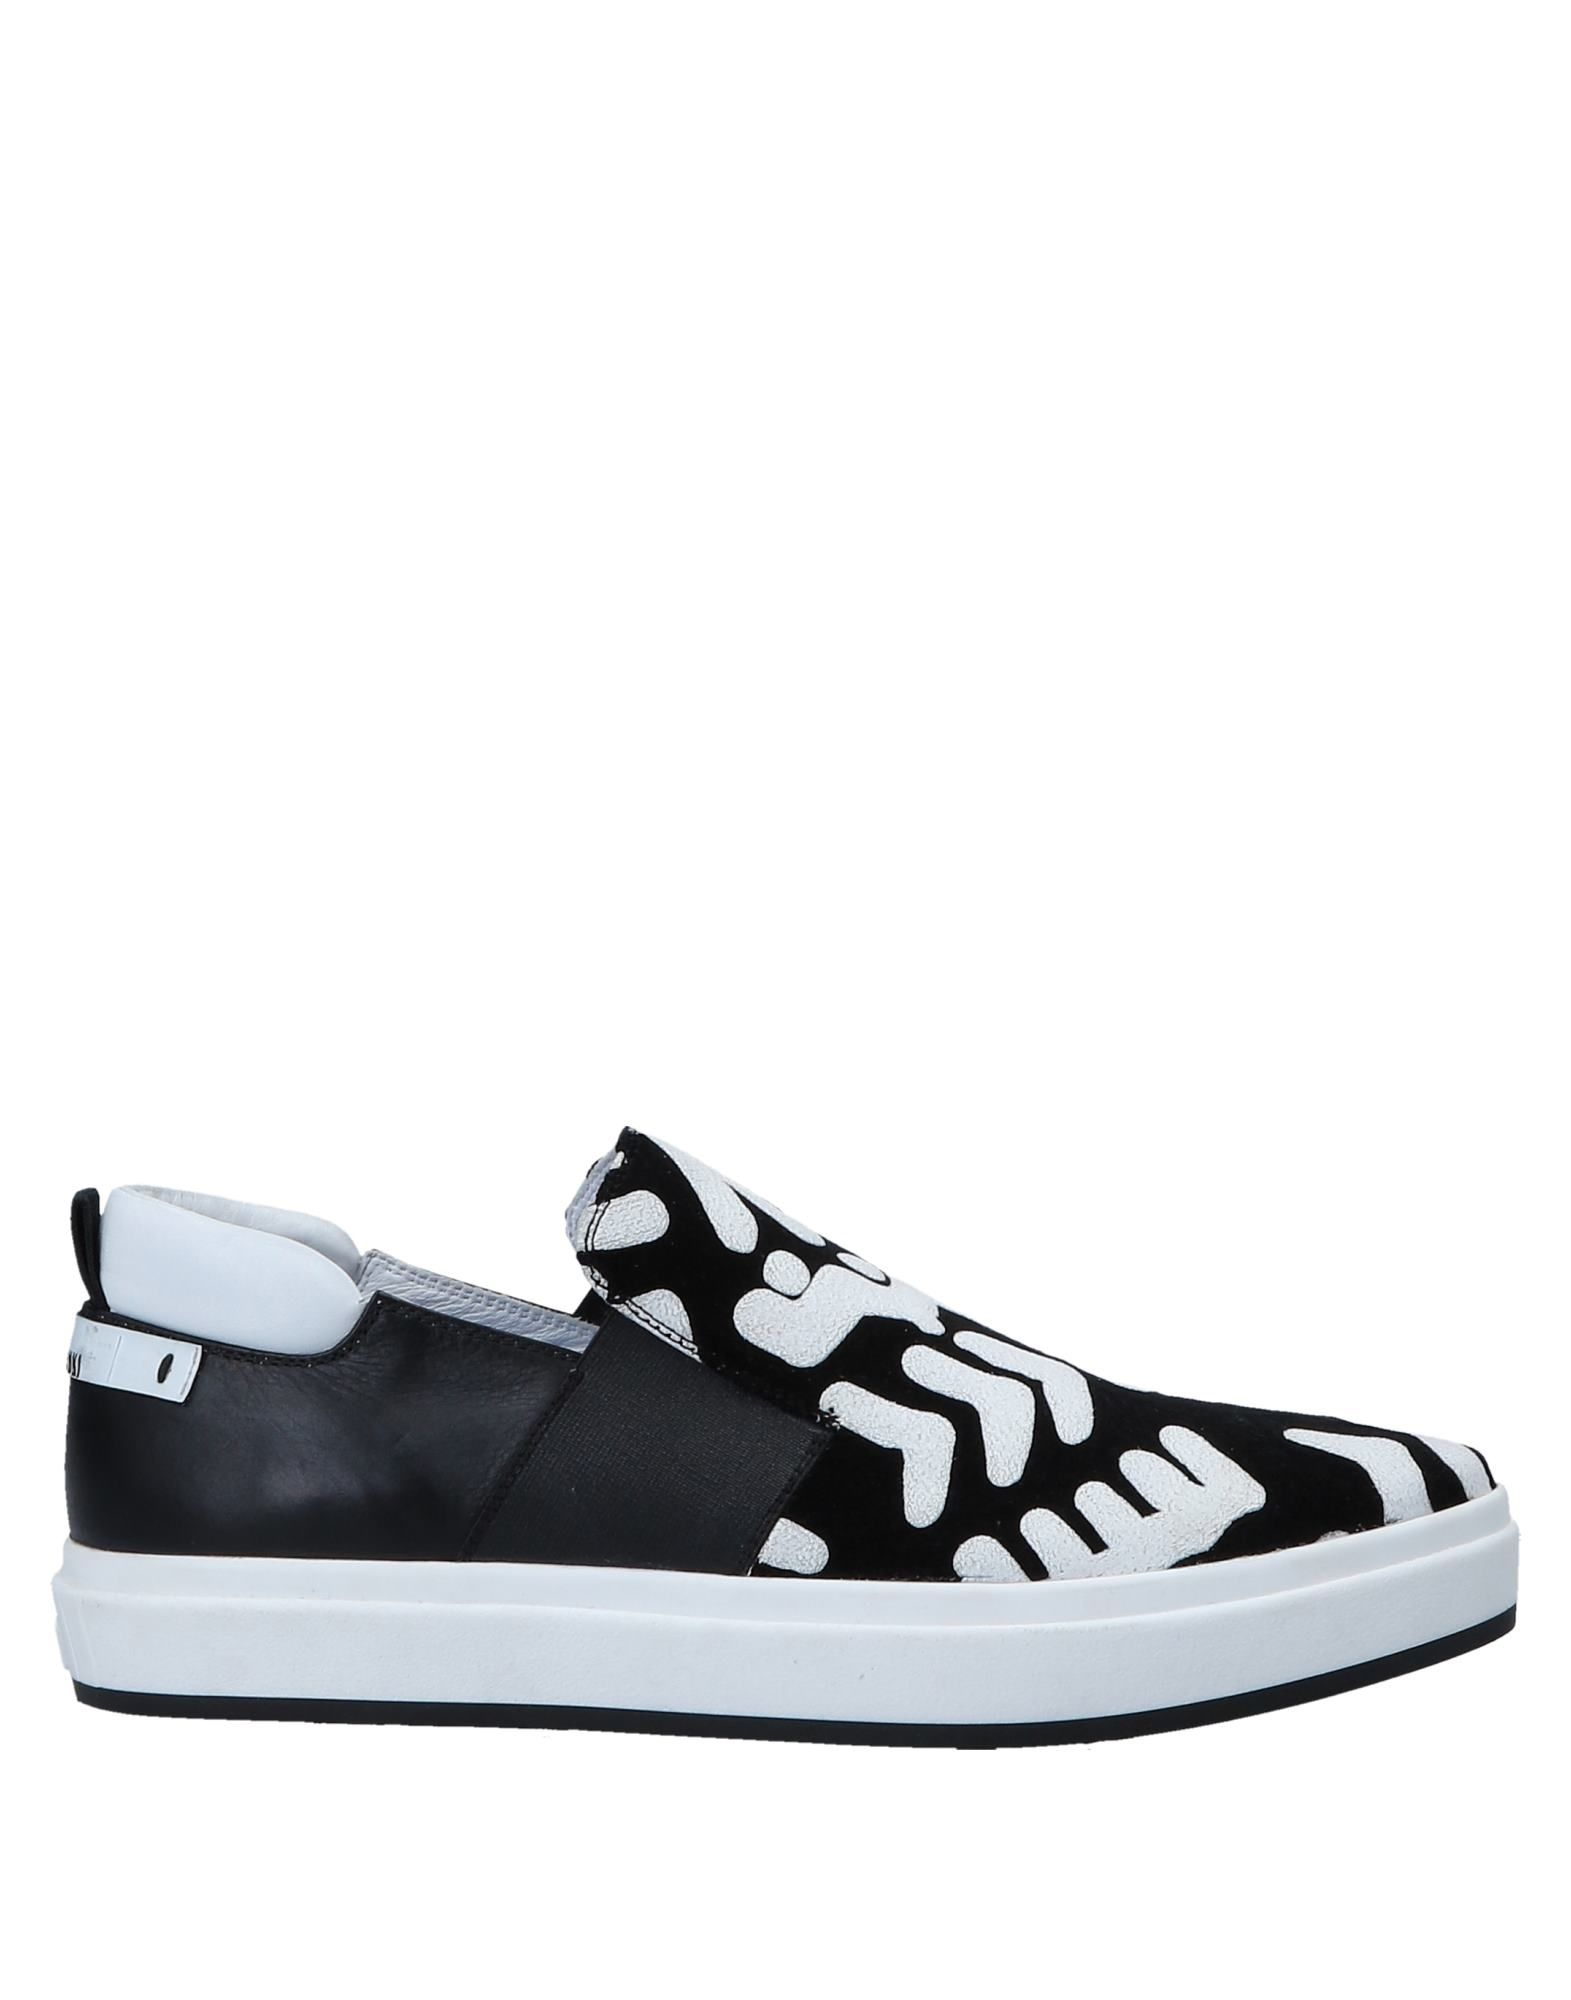 Shy By Arvid Yuki By Sneakers - Women Shy By Yuki Arvid Yuki Sneakers online on  Australia - 11556864MR b2cac1